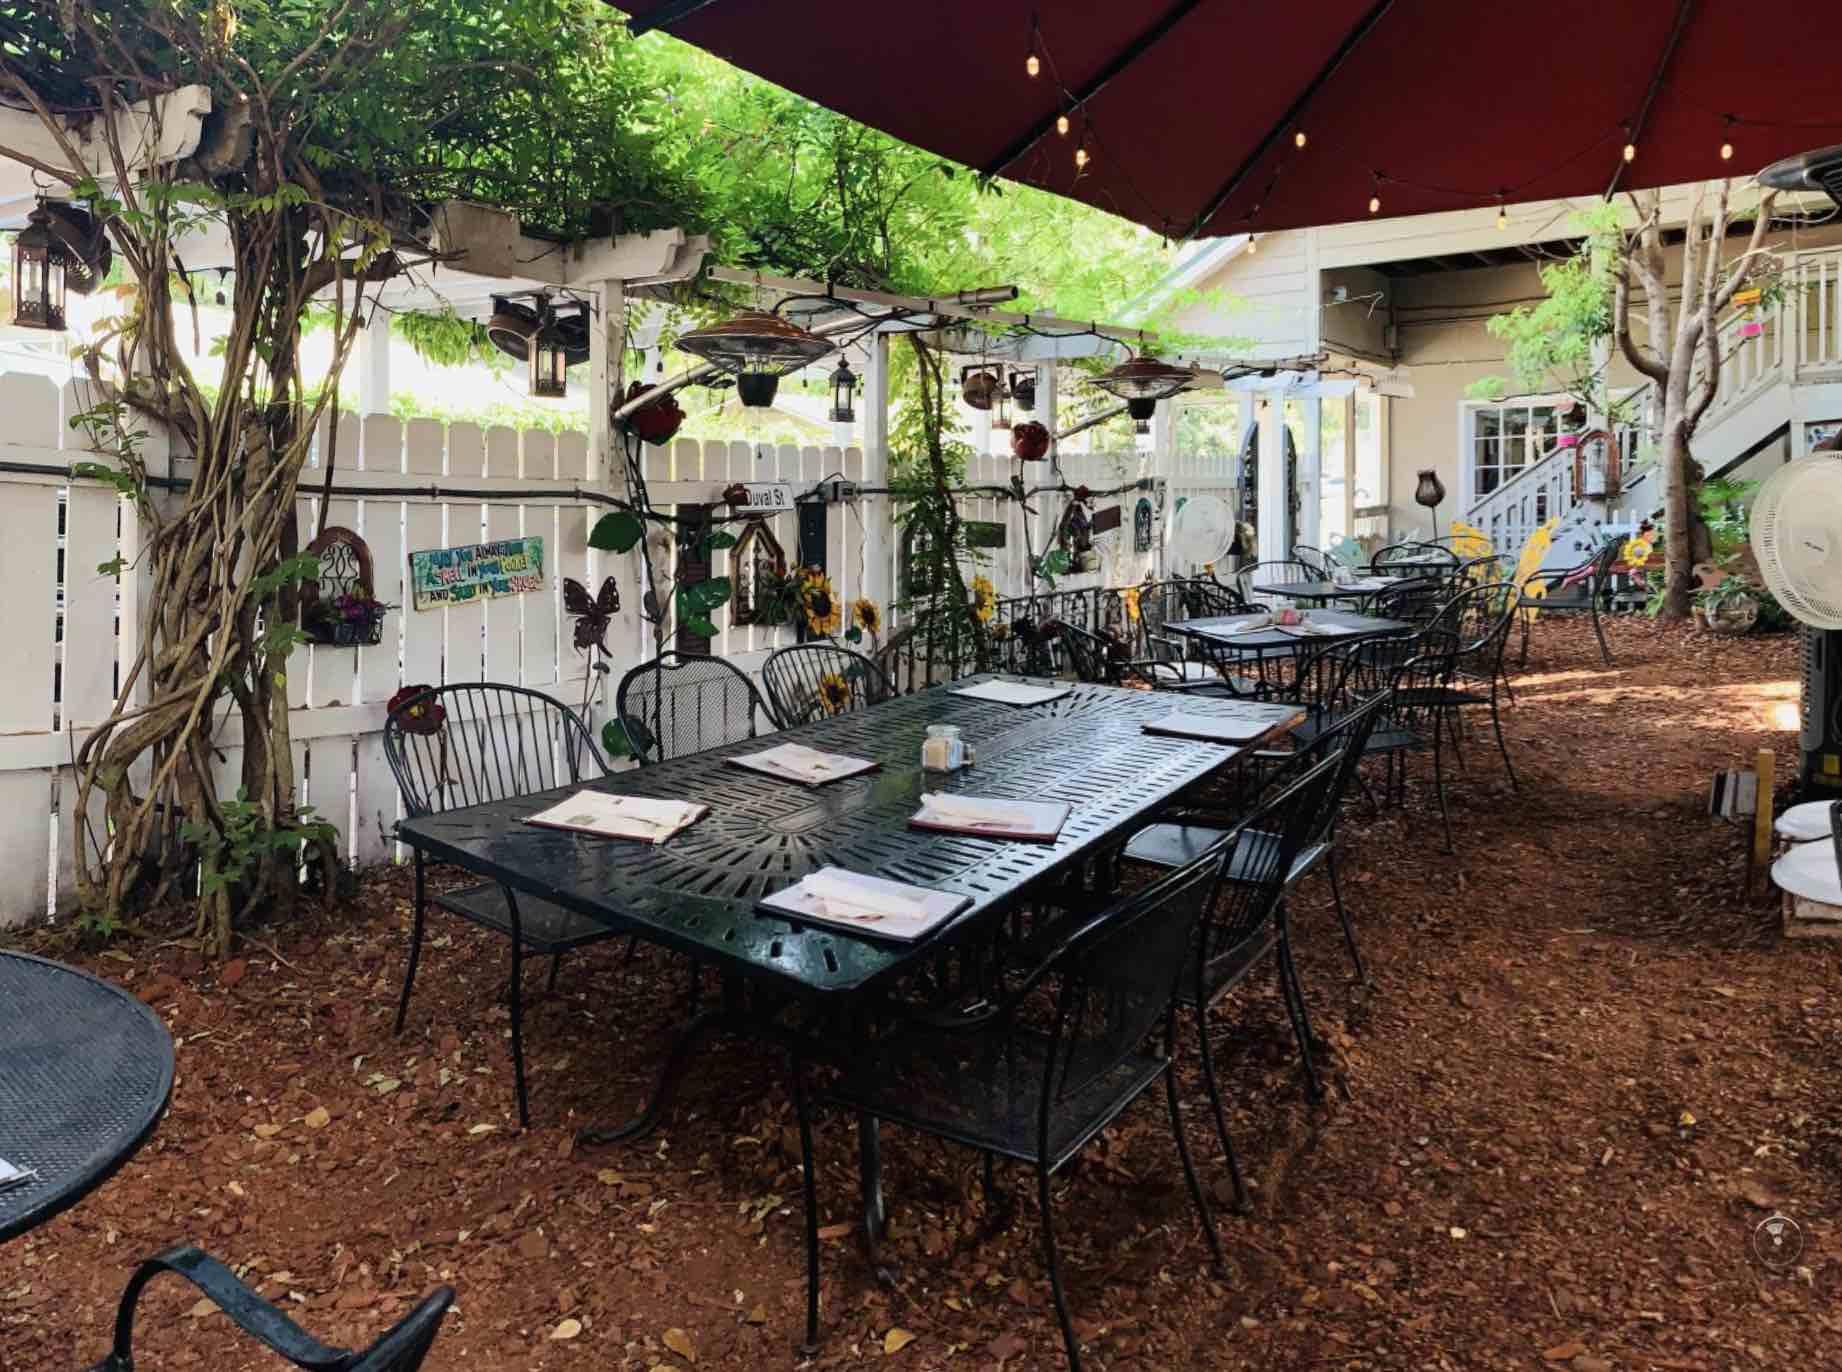 48 HQ Photos Lowcountry Backyard Restaurant : A Lowcountry ...